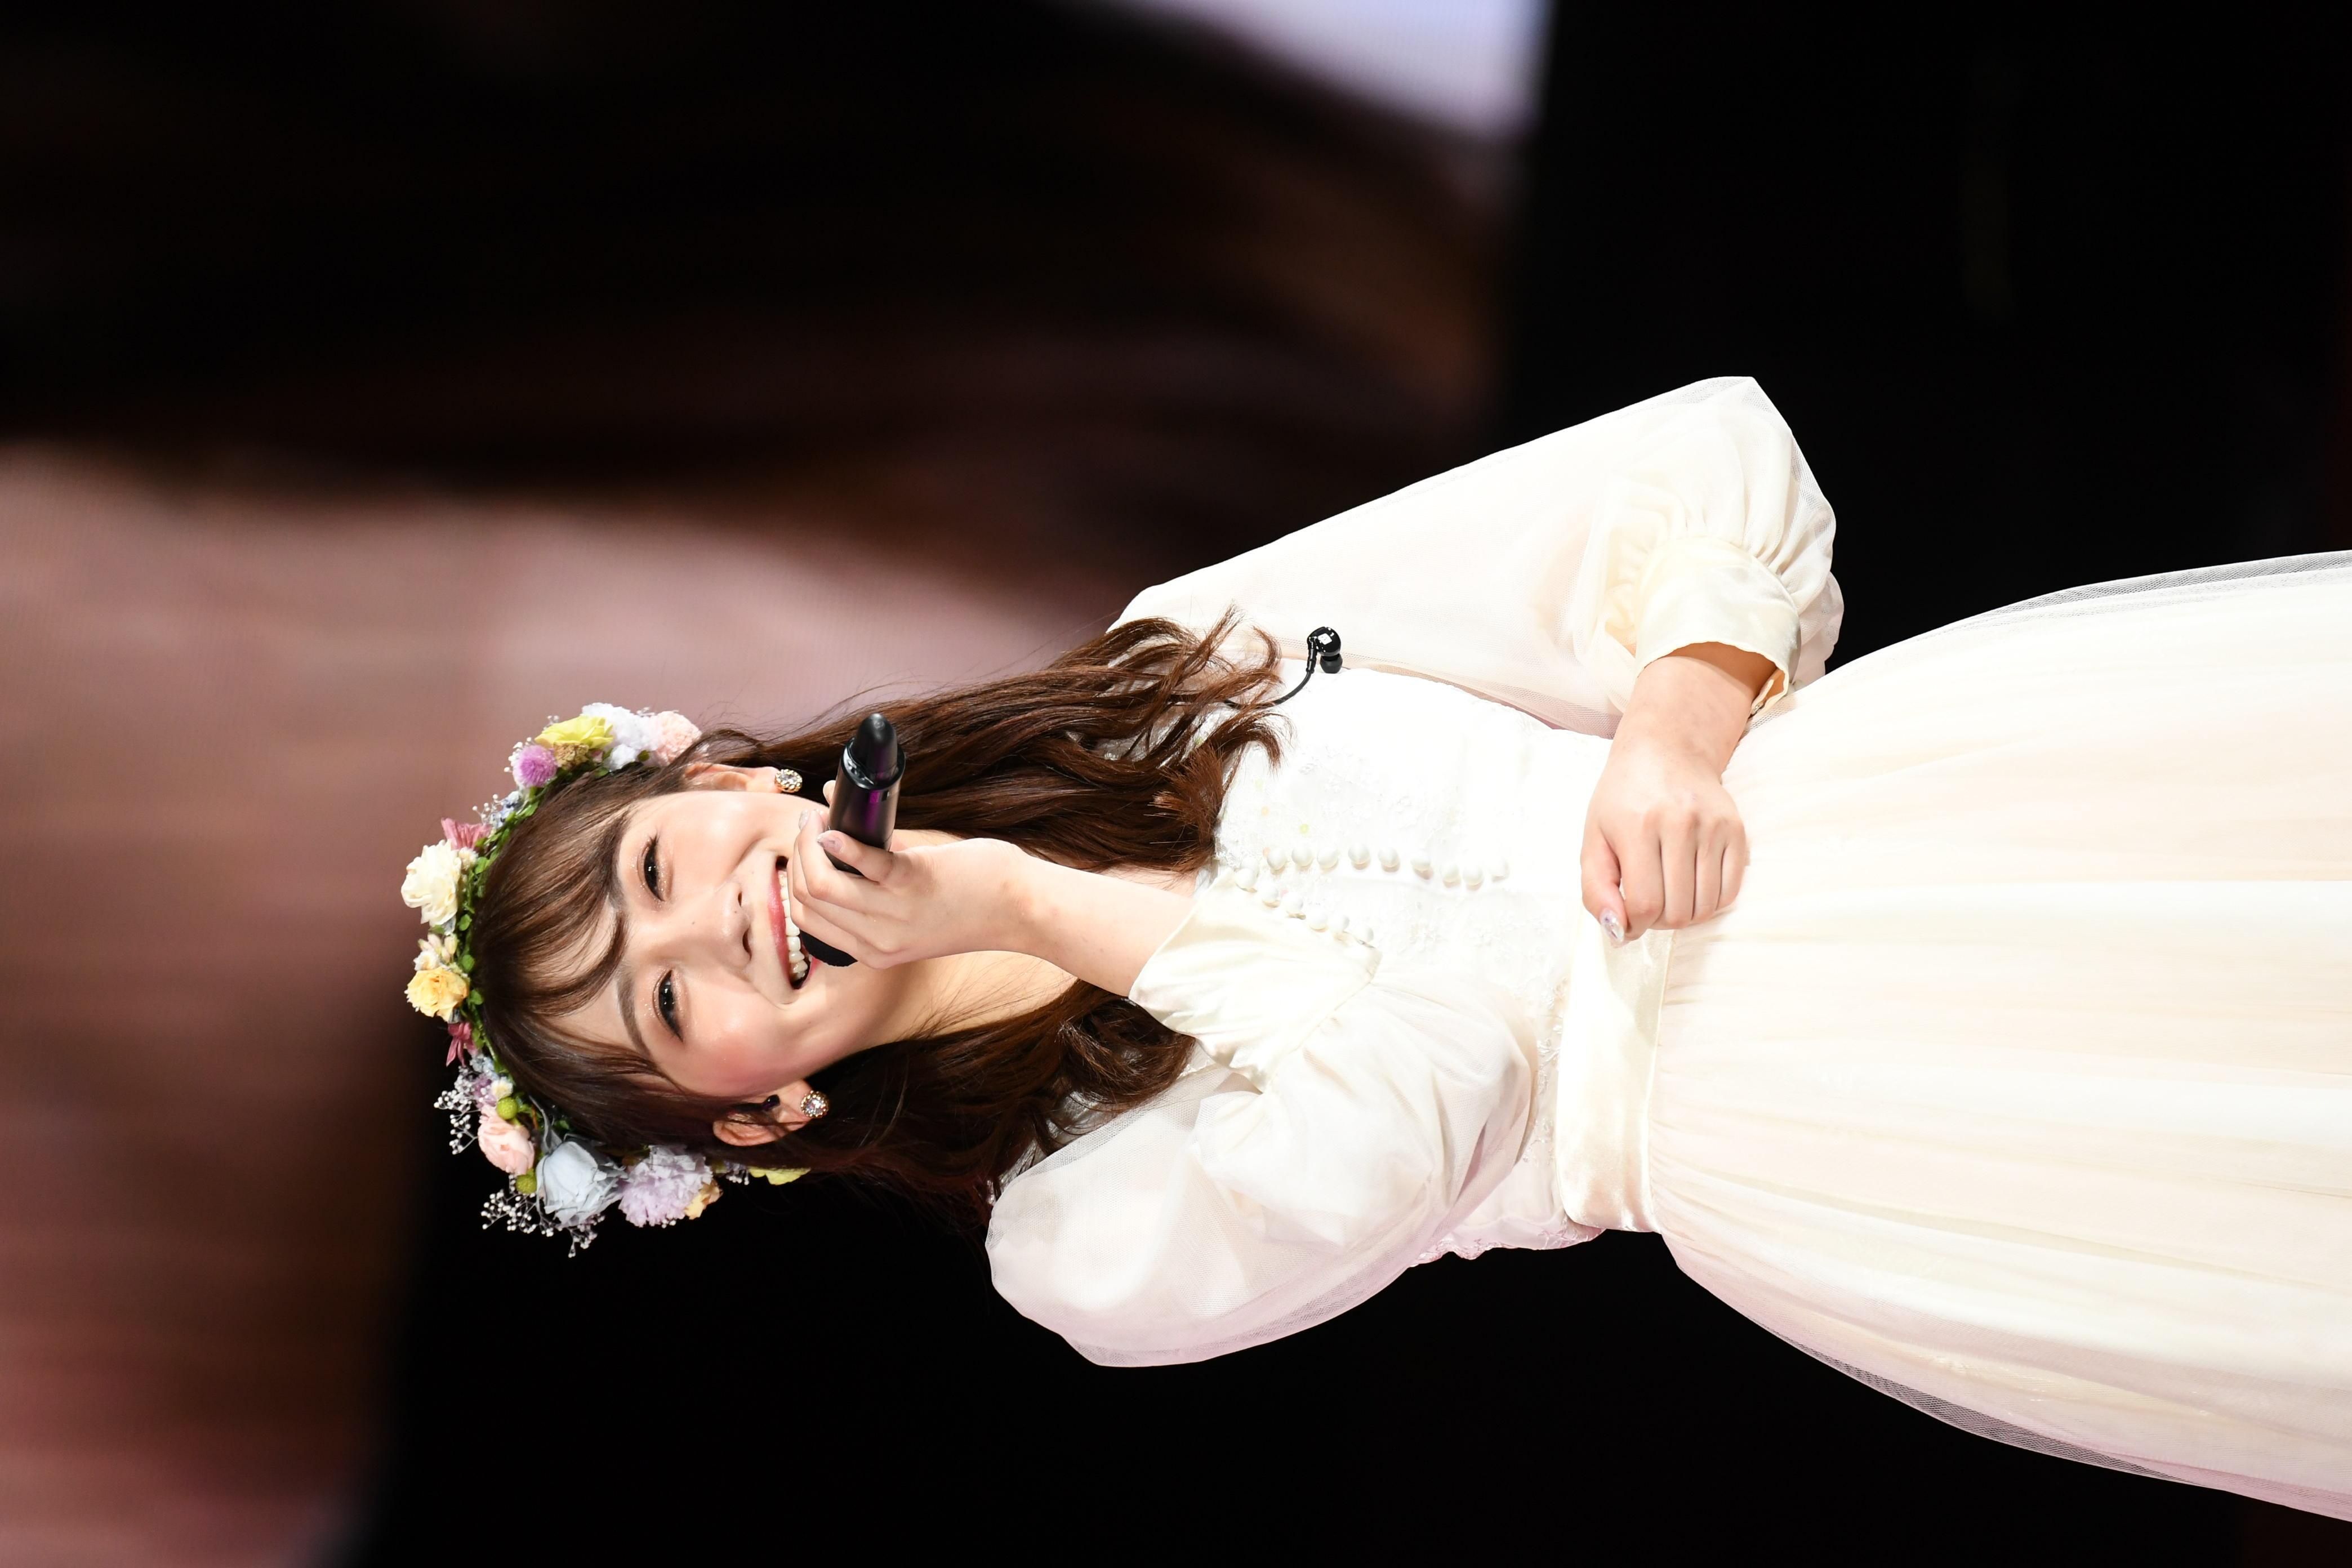 AKB48小嶋真子「笑顔で卒業」AKB48フェスのトリを飾る【写真19枚】の画像018